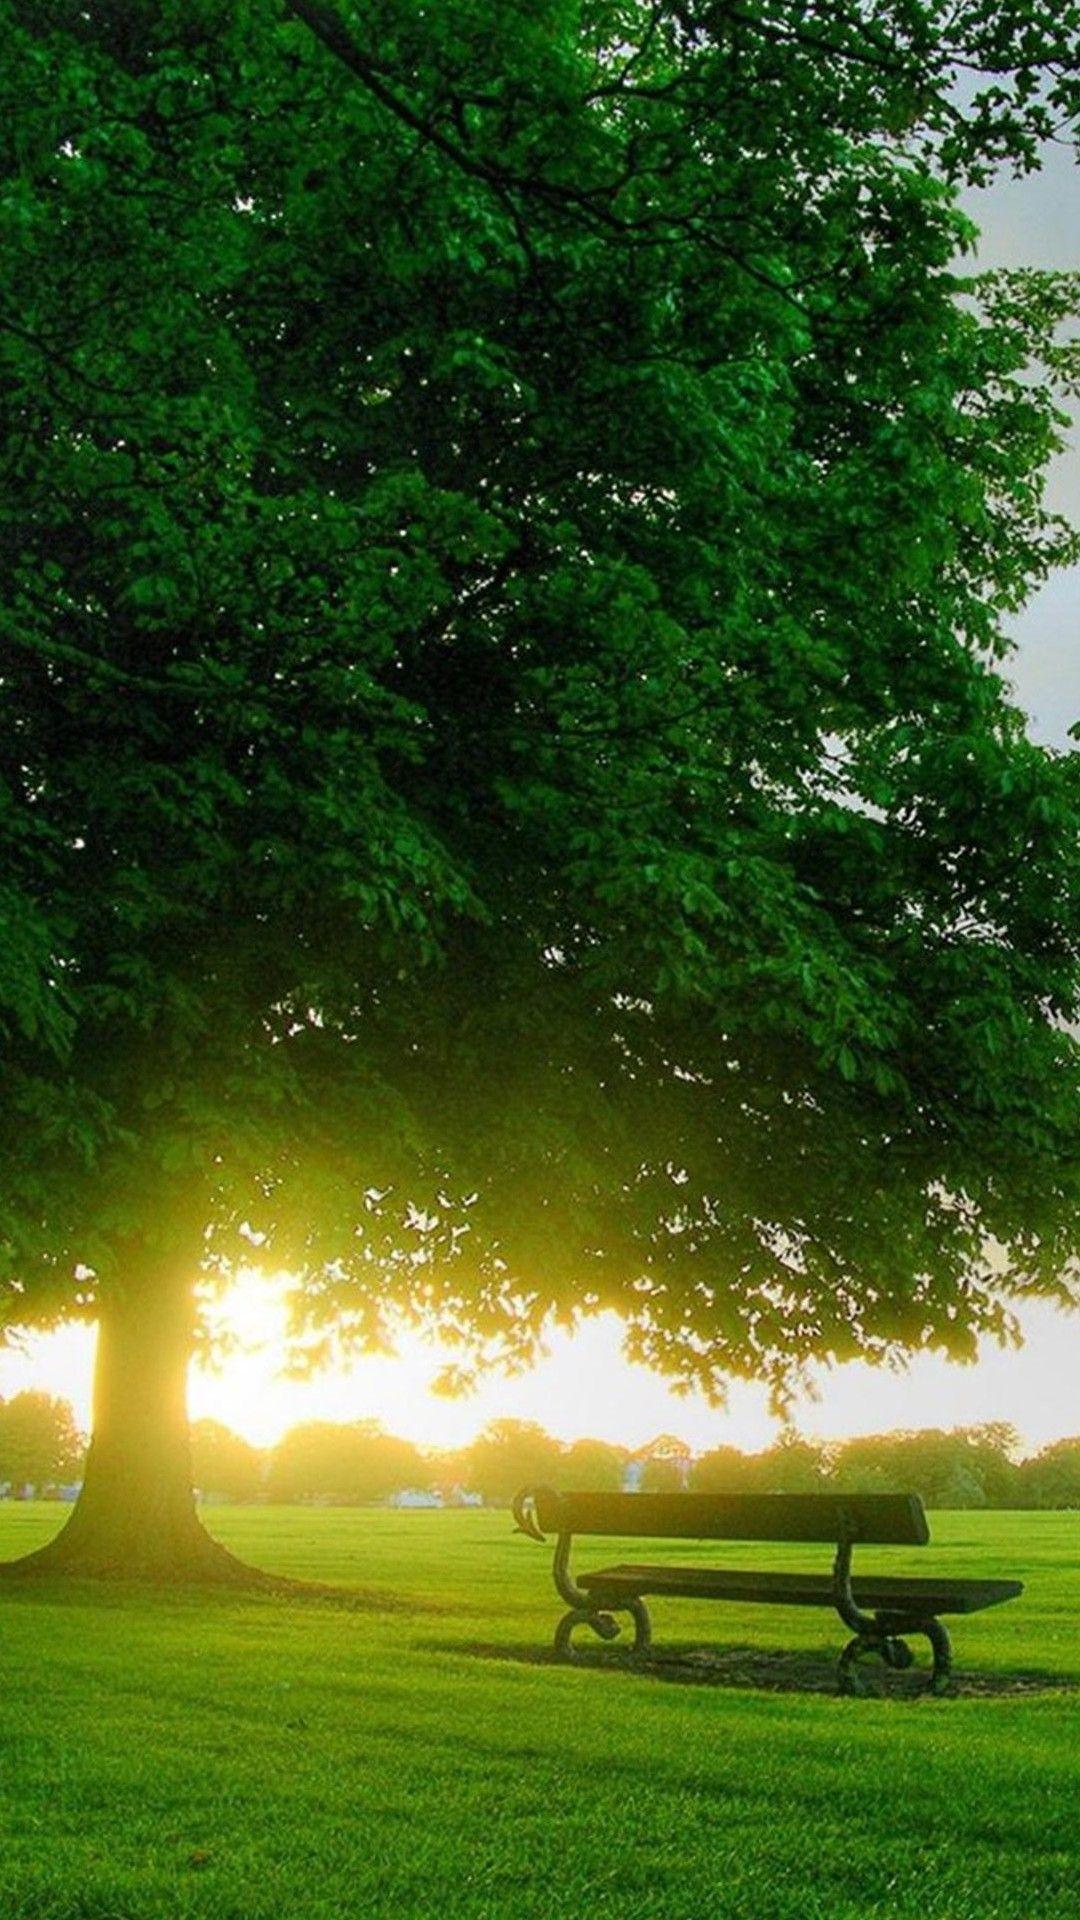 Nature LG G2 Wallpapers HD 95 | Wallpapers | Pinterest ...  Nature LG G2 Wa...